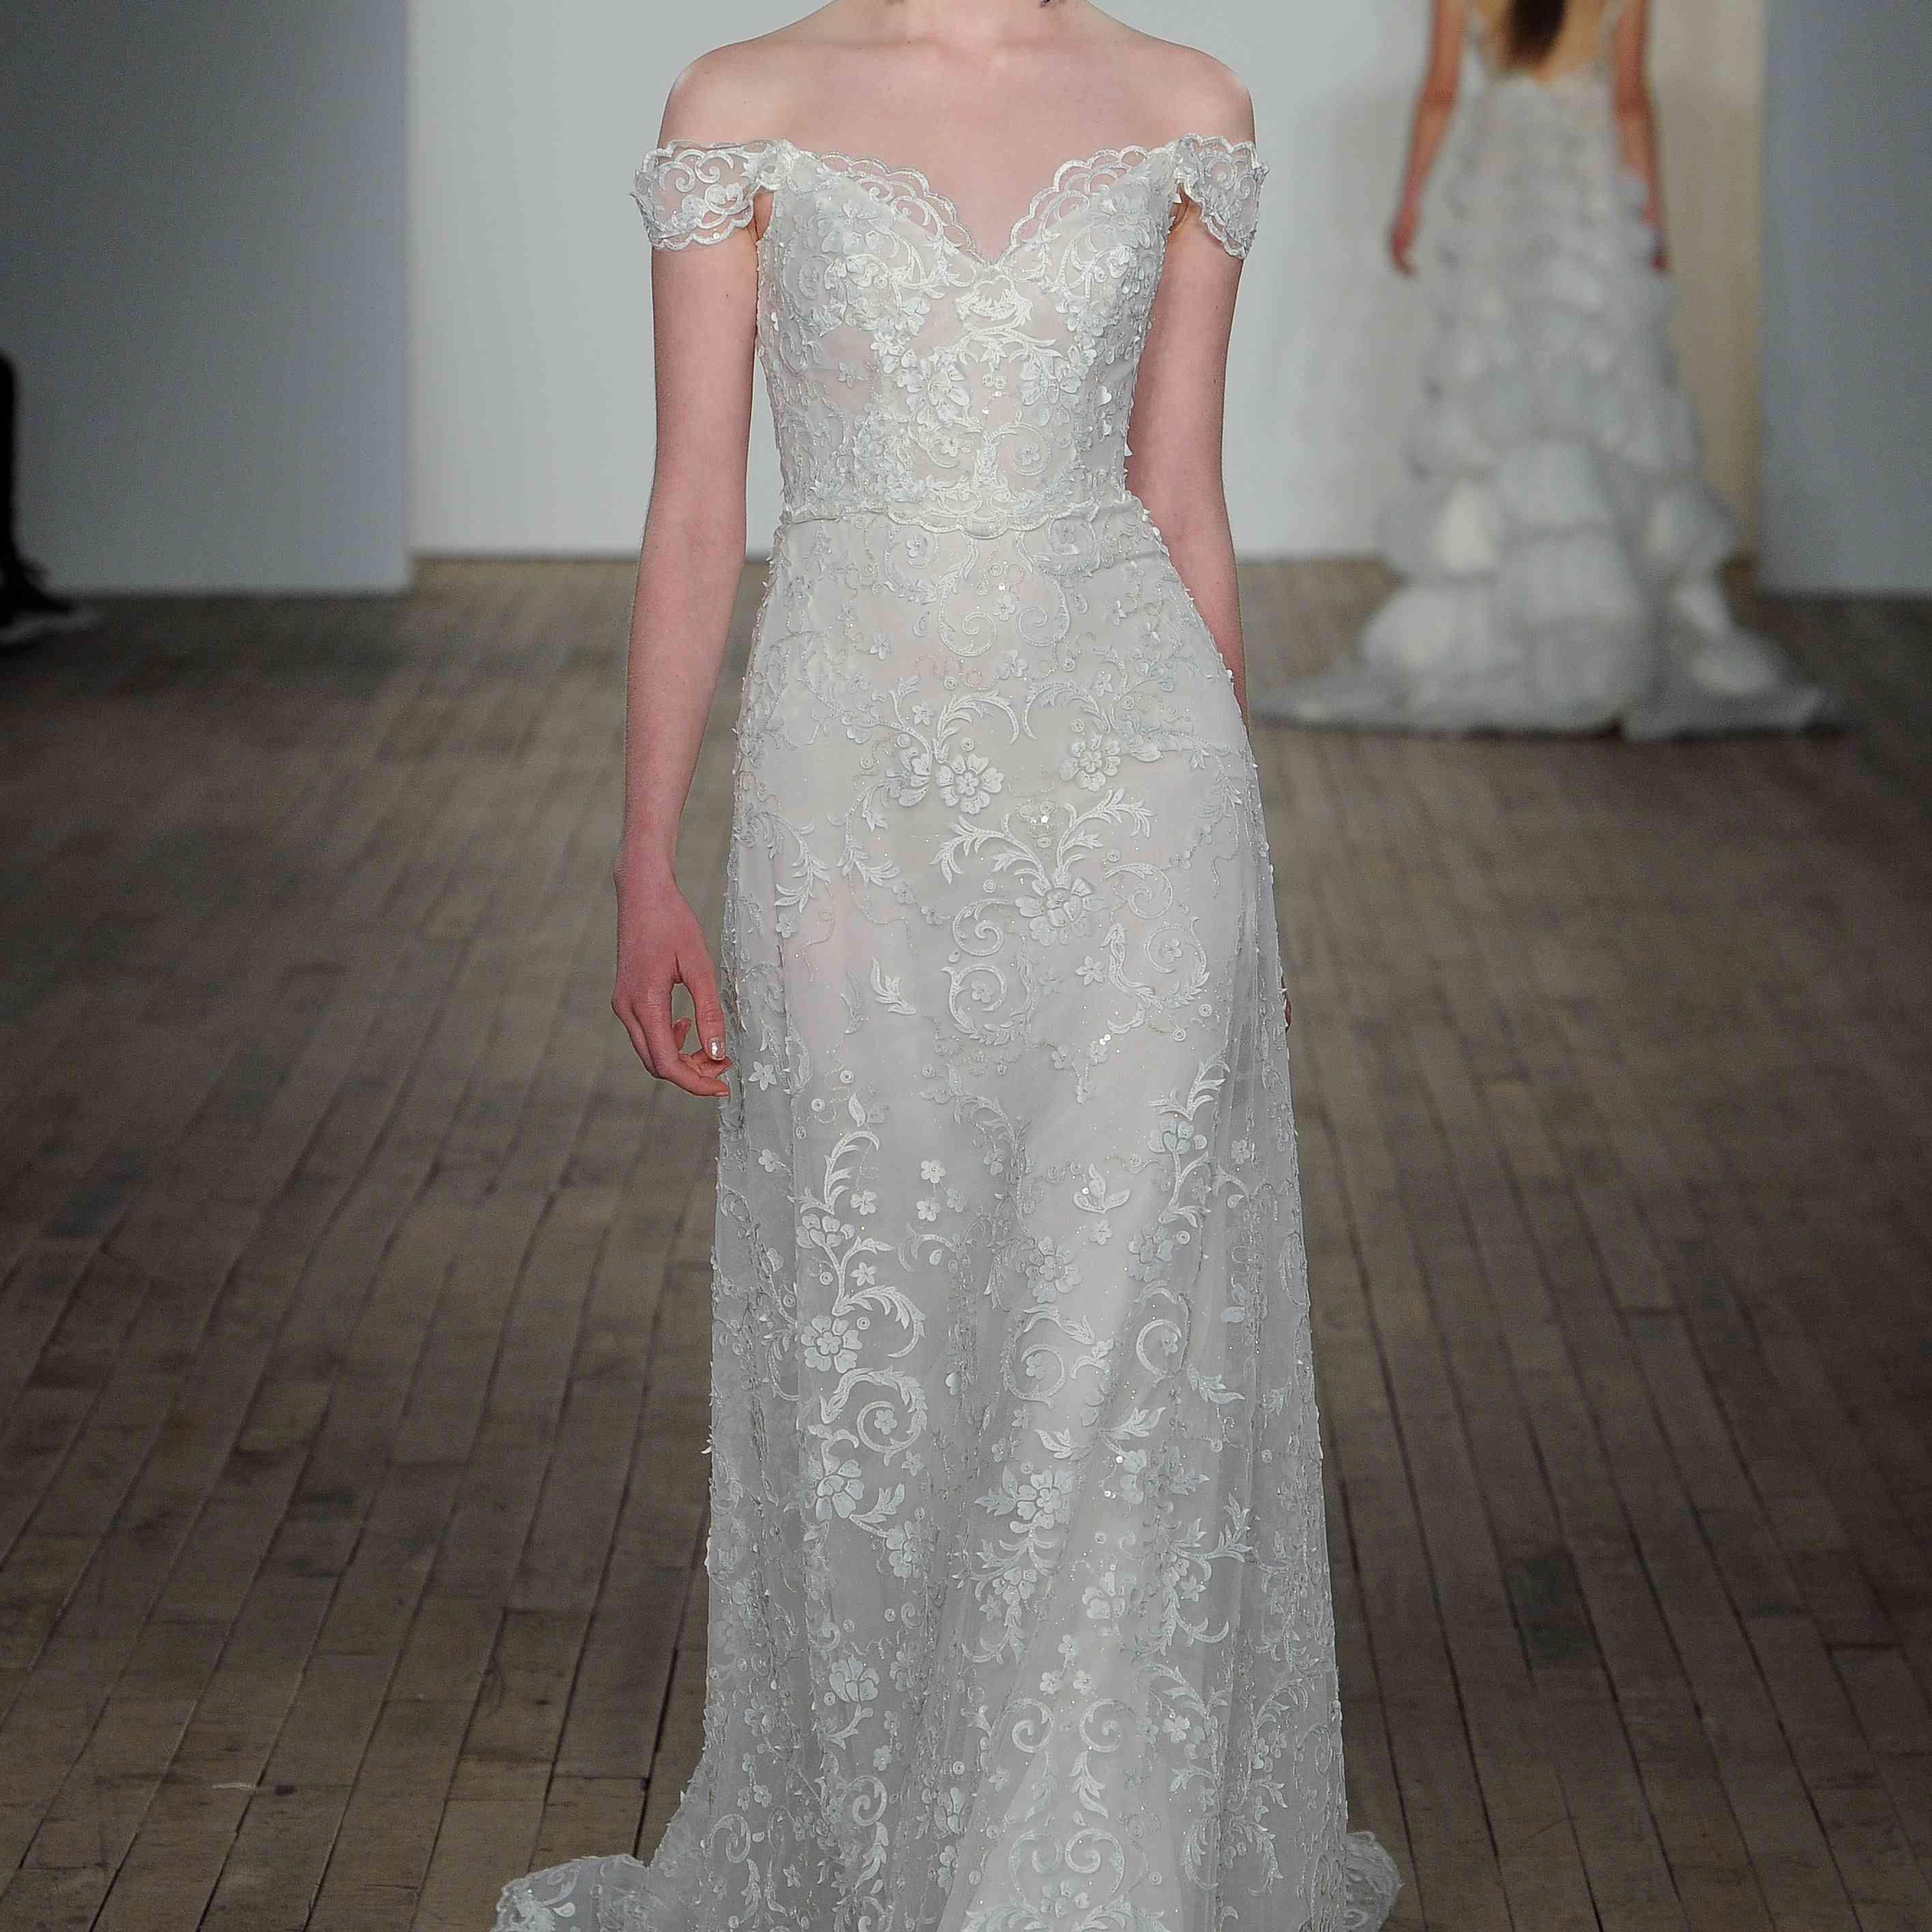 Bea off-the-shoulder wedding dress by lazaro